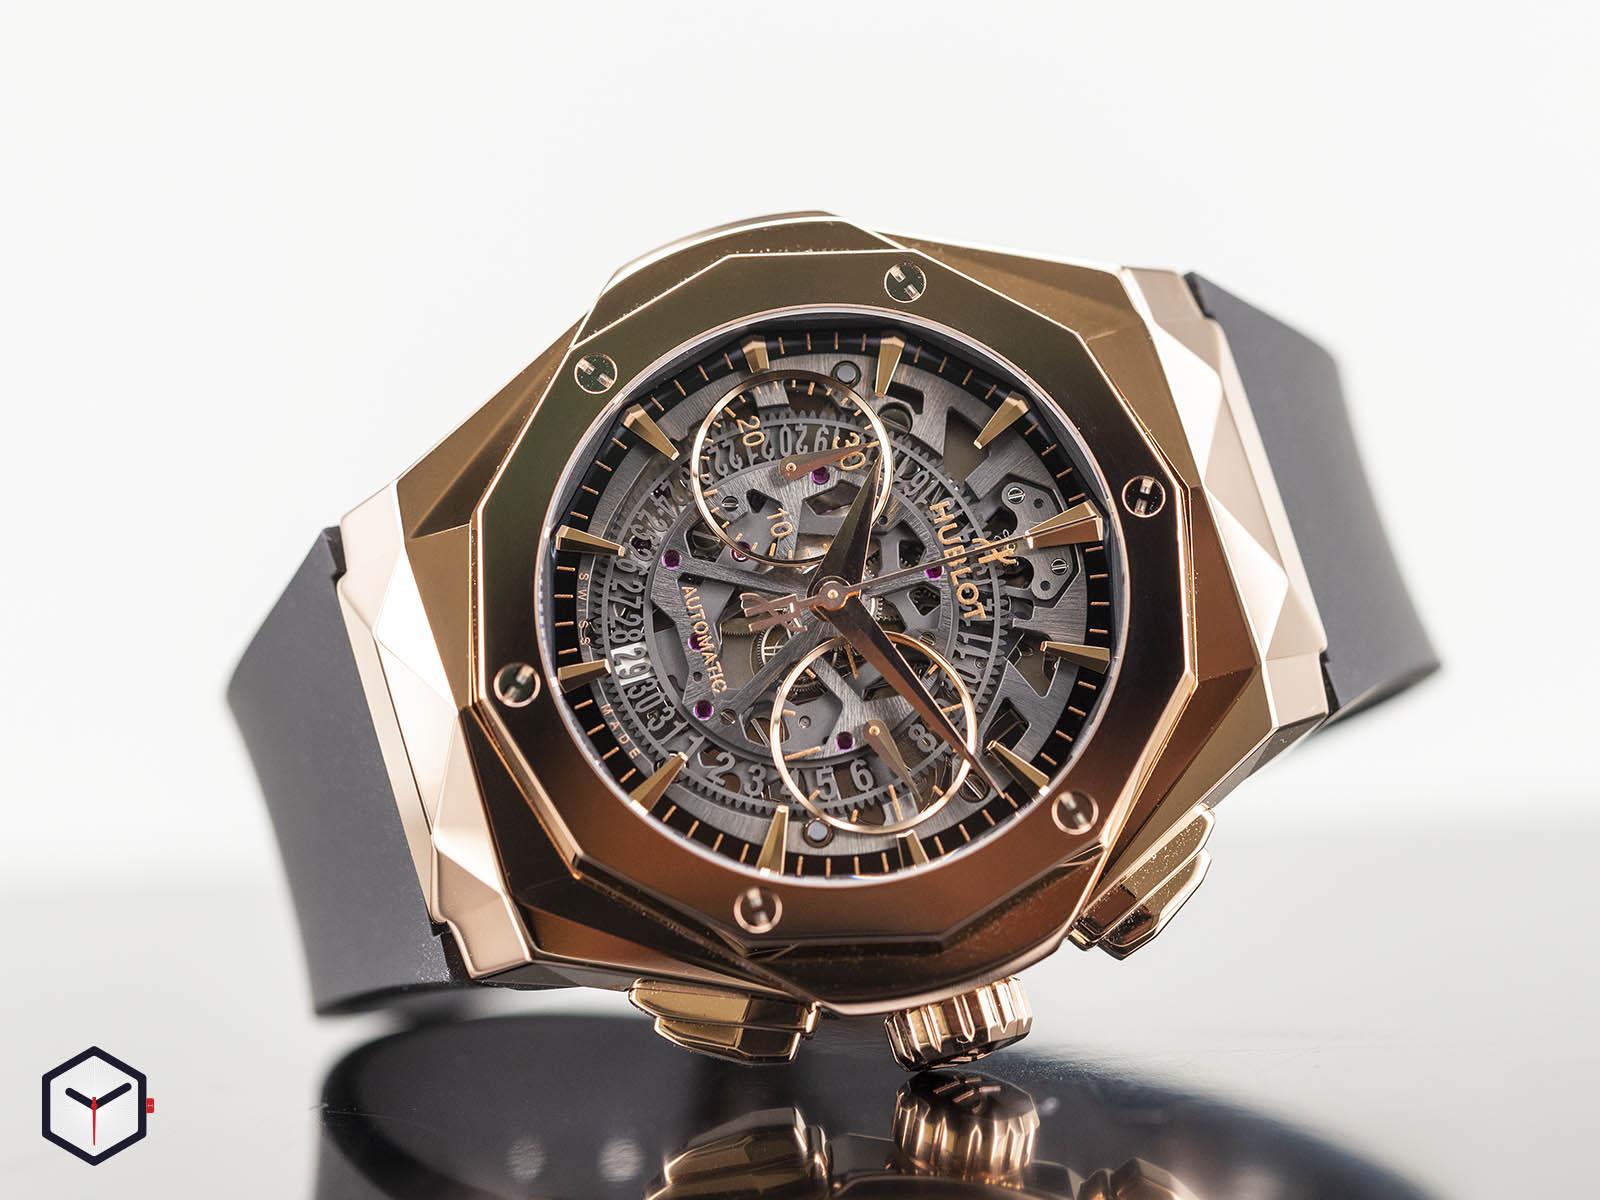 525-ox-0180-rx-orl18-hublot-classic-fusion-aerofusion-chronograph-orlinski-king-gold-1.jpg